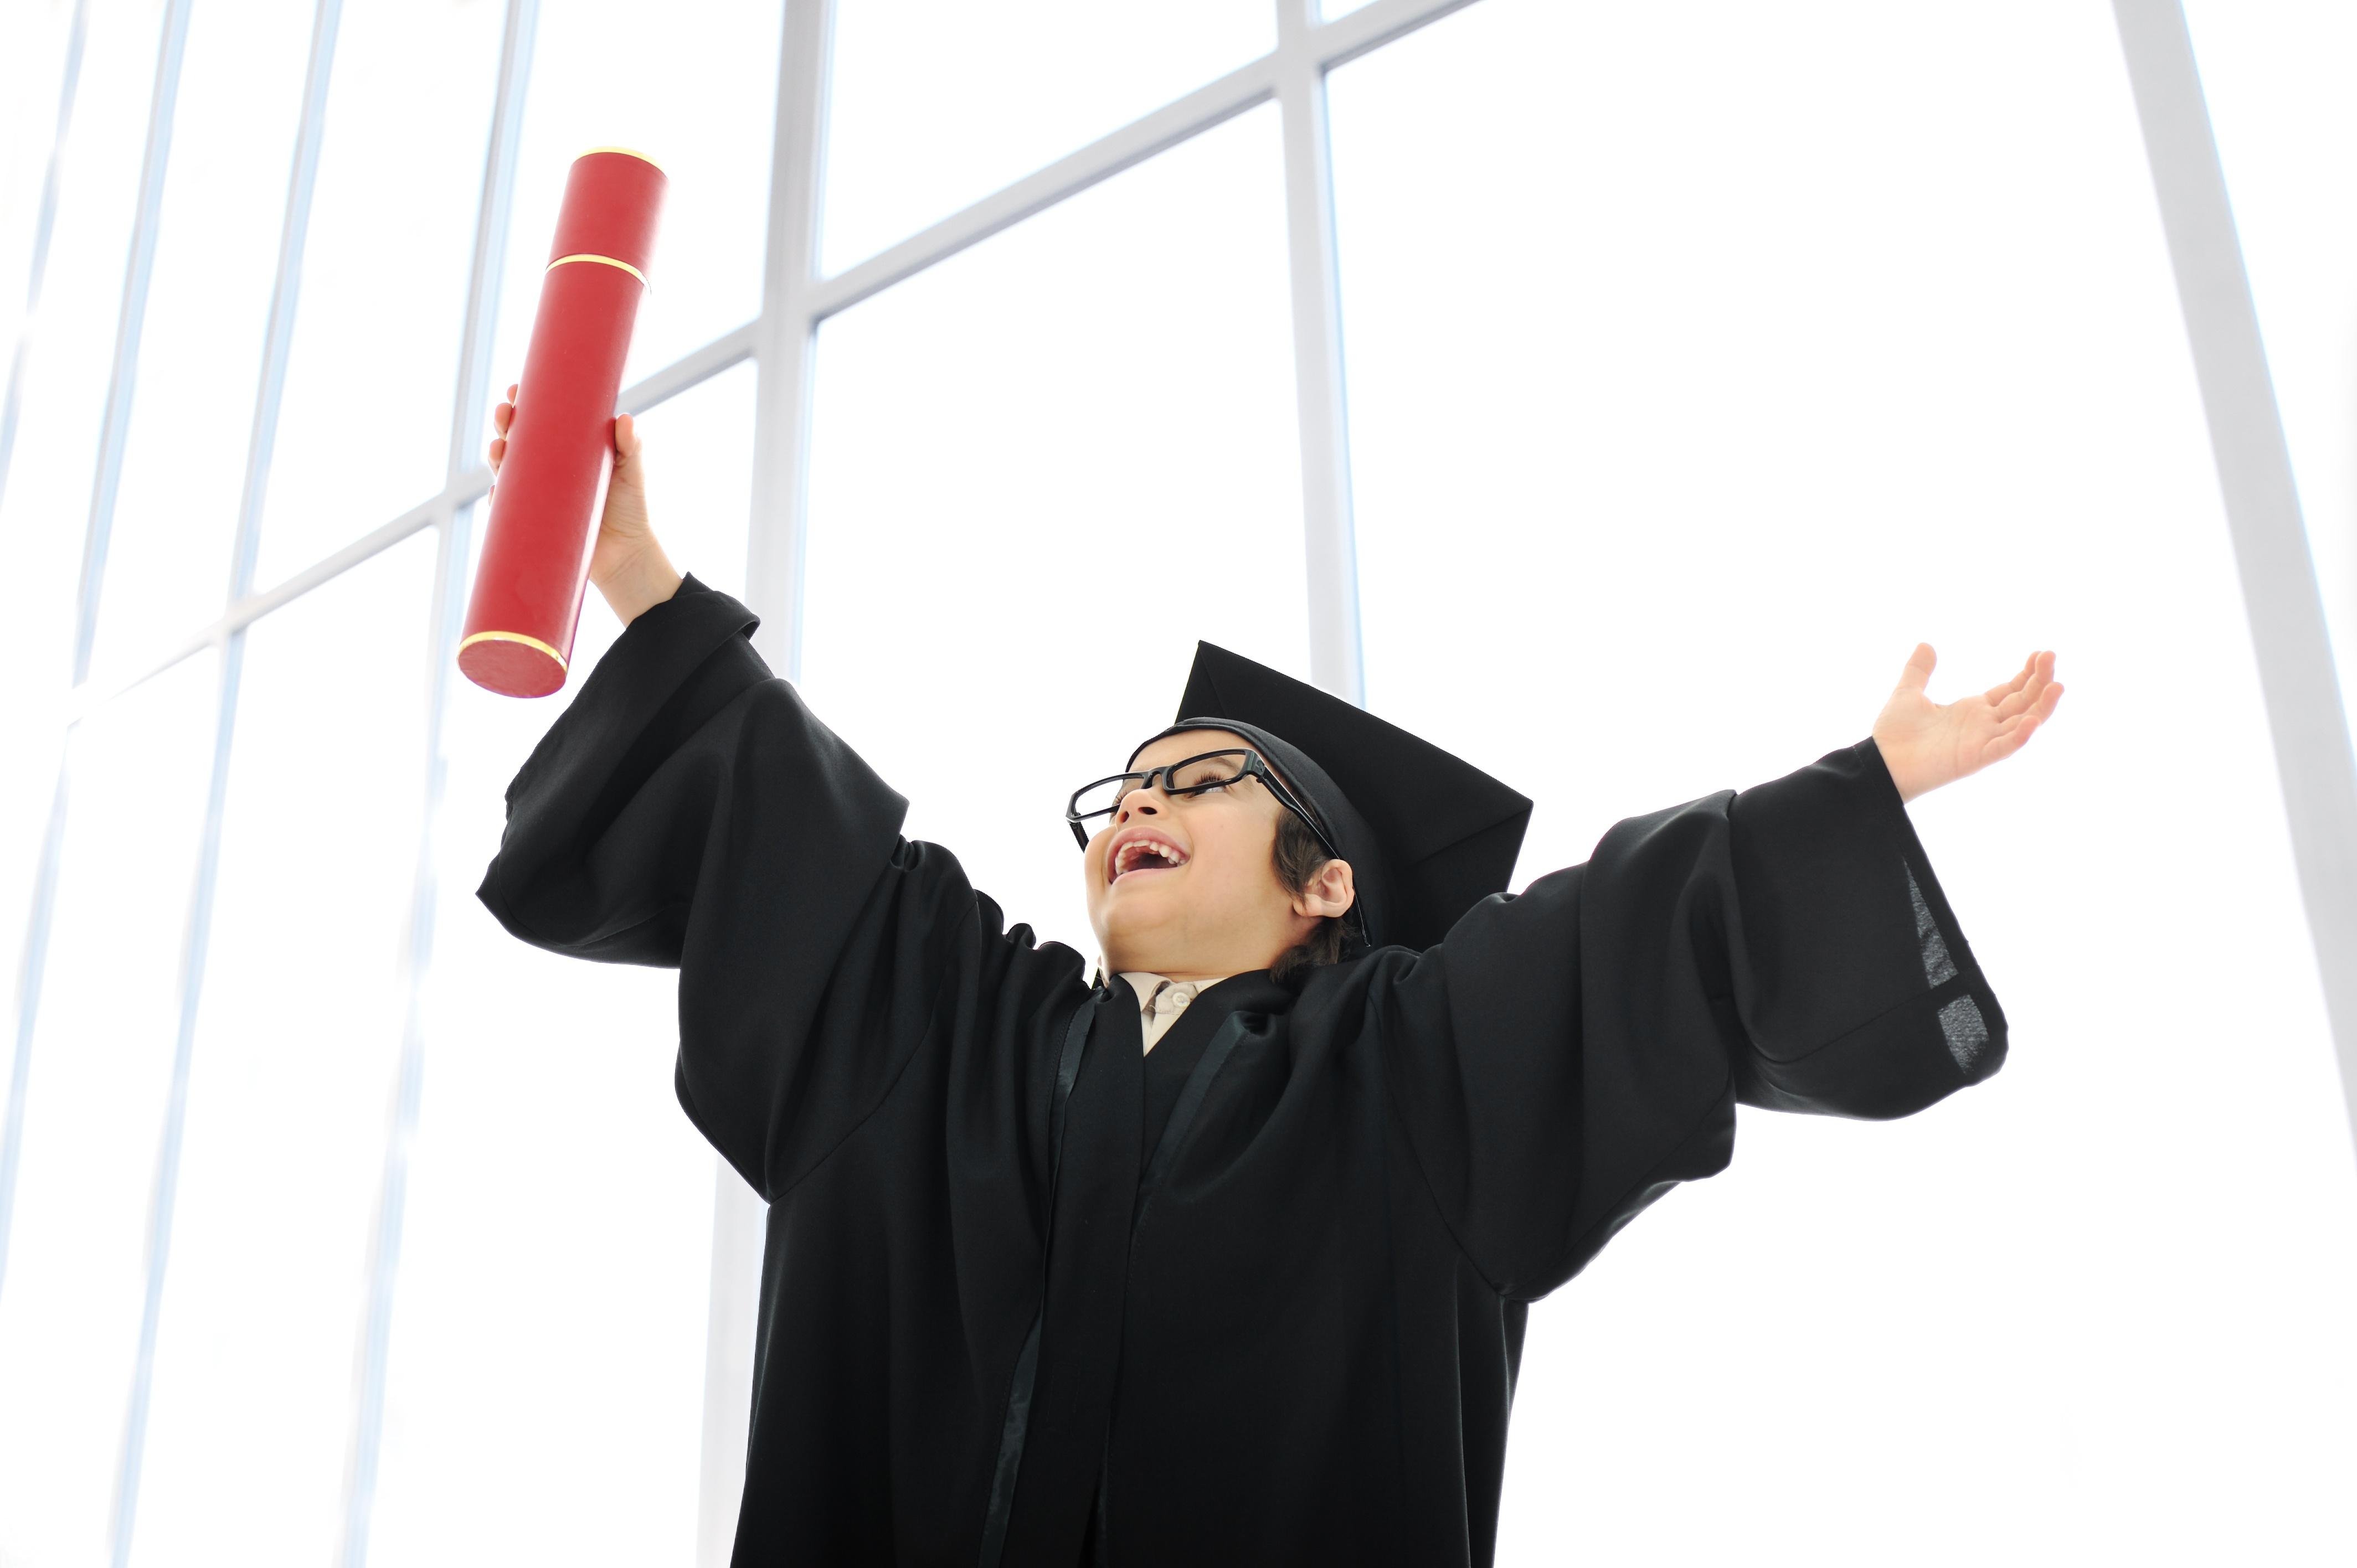 kid-celebrating-graduating-diploma_HKglcPRTrs.jpg